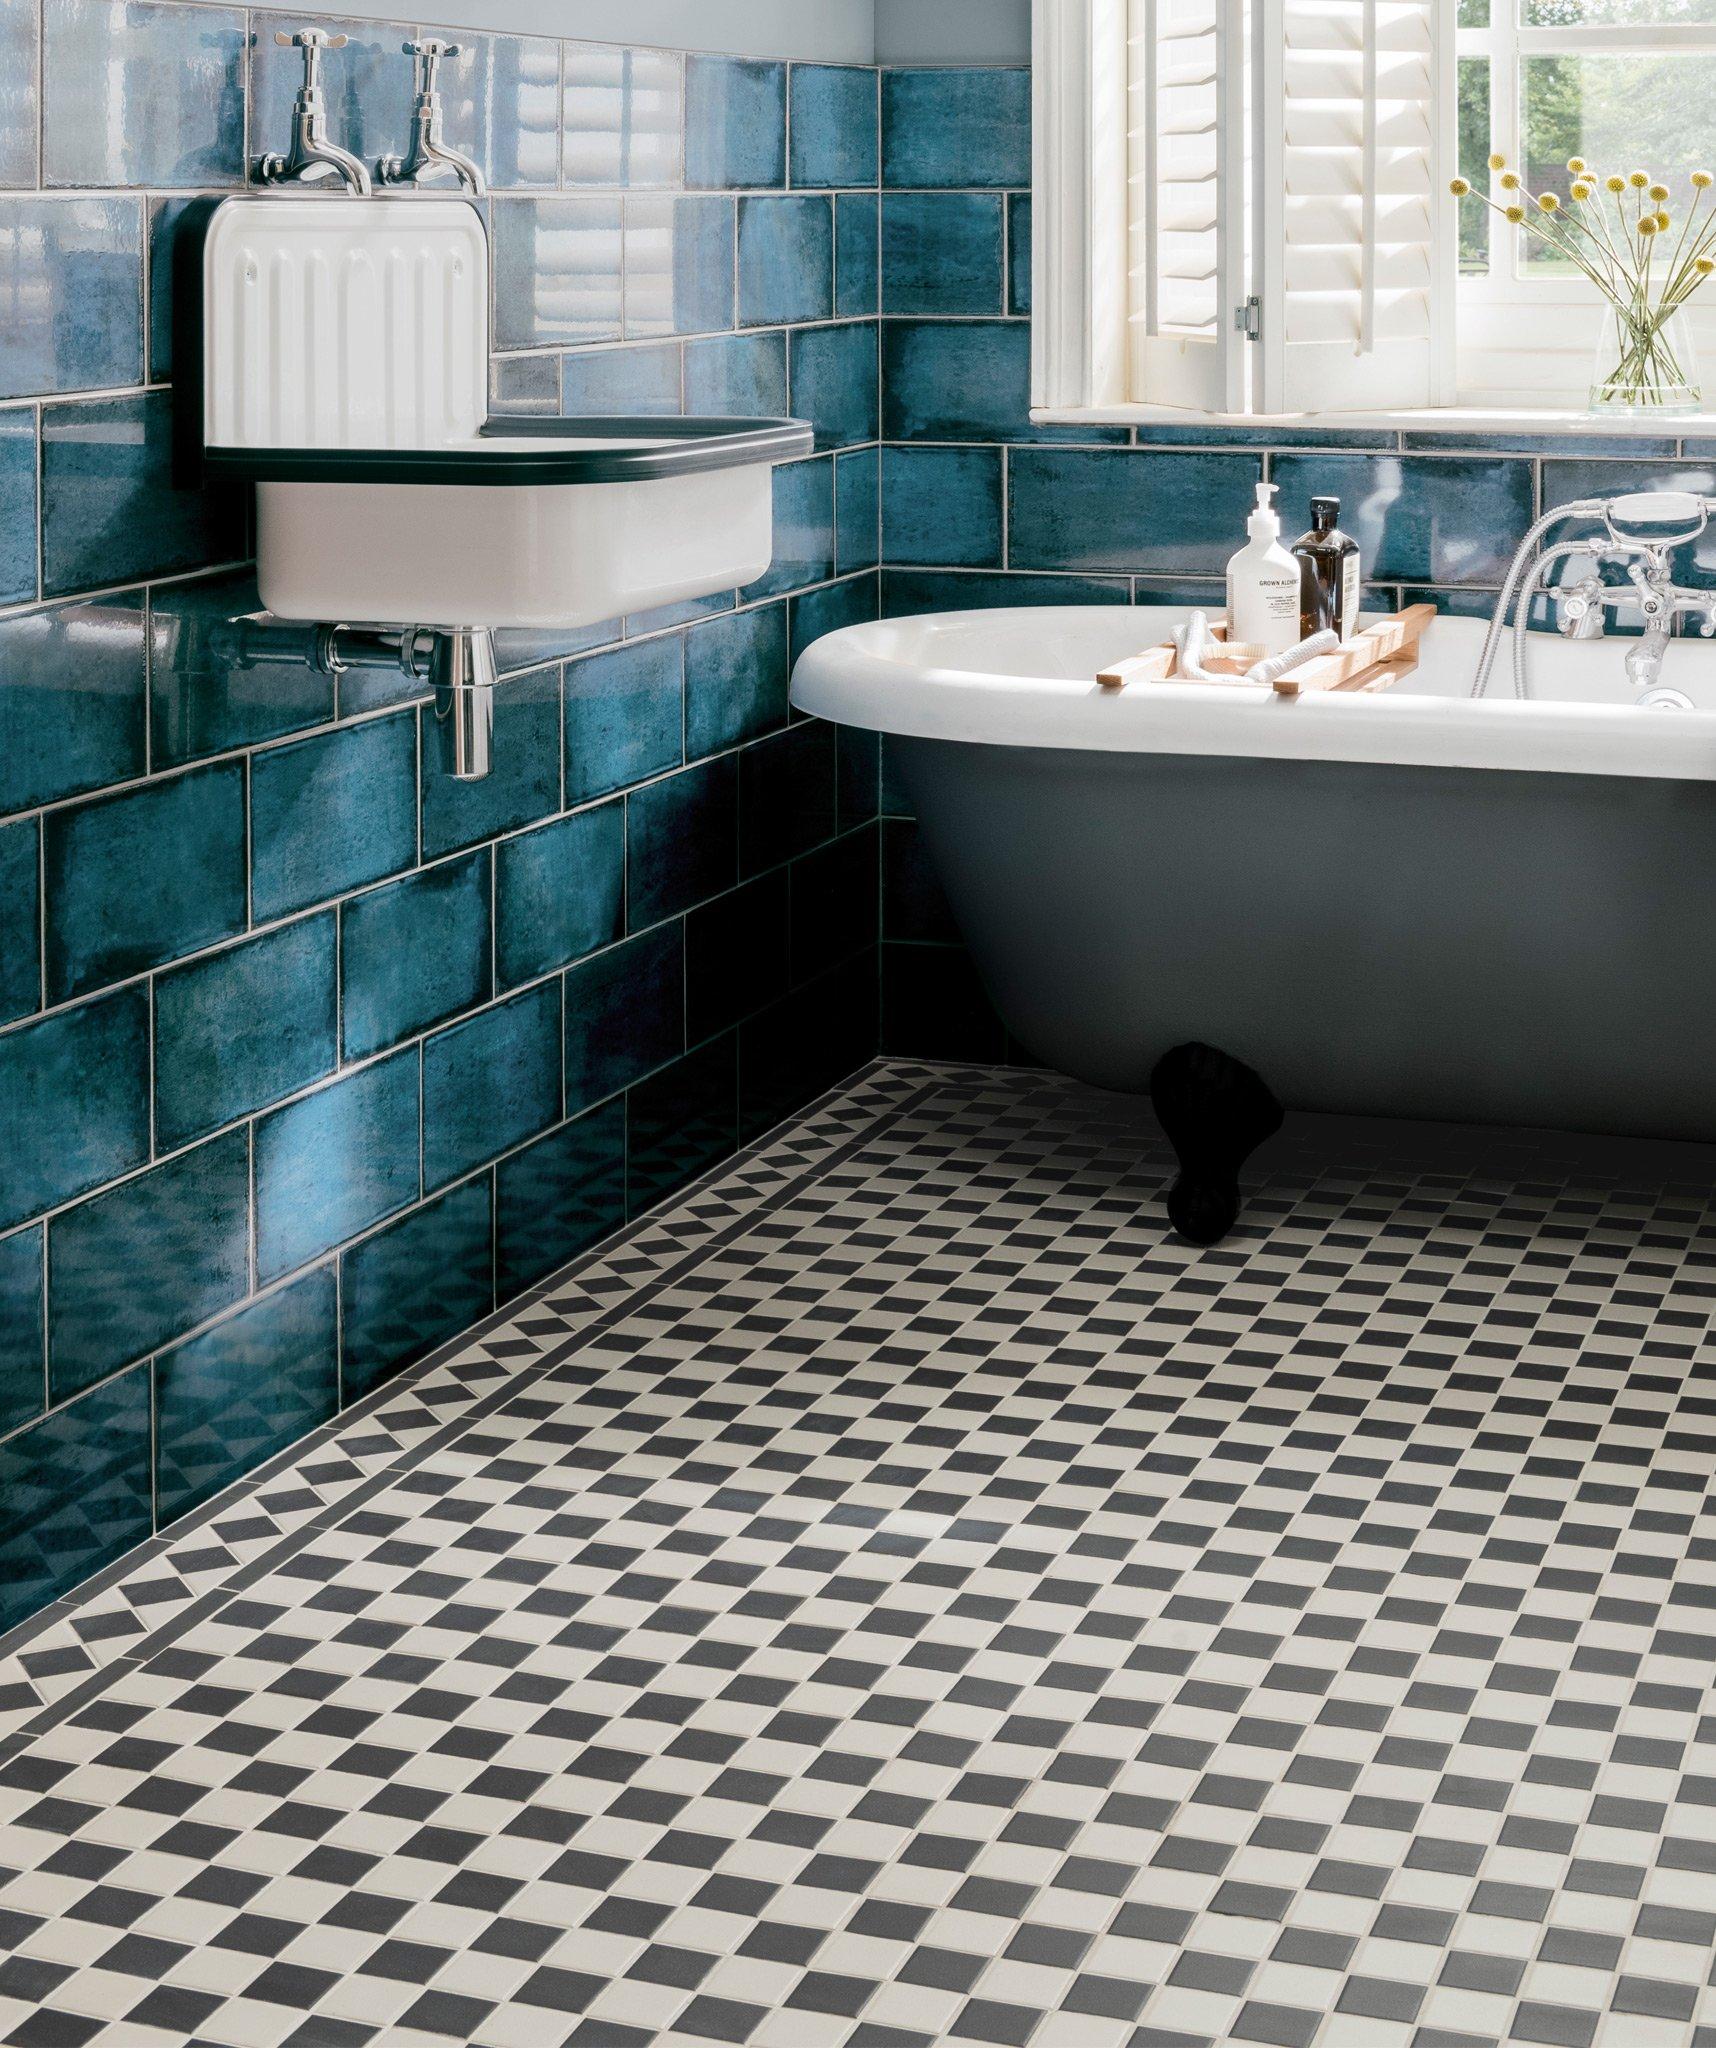 Victorian Mosaics Topps Tiles, Black And White Bathroom Tile